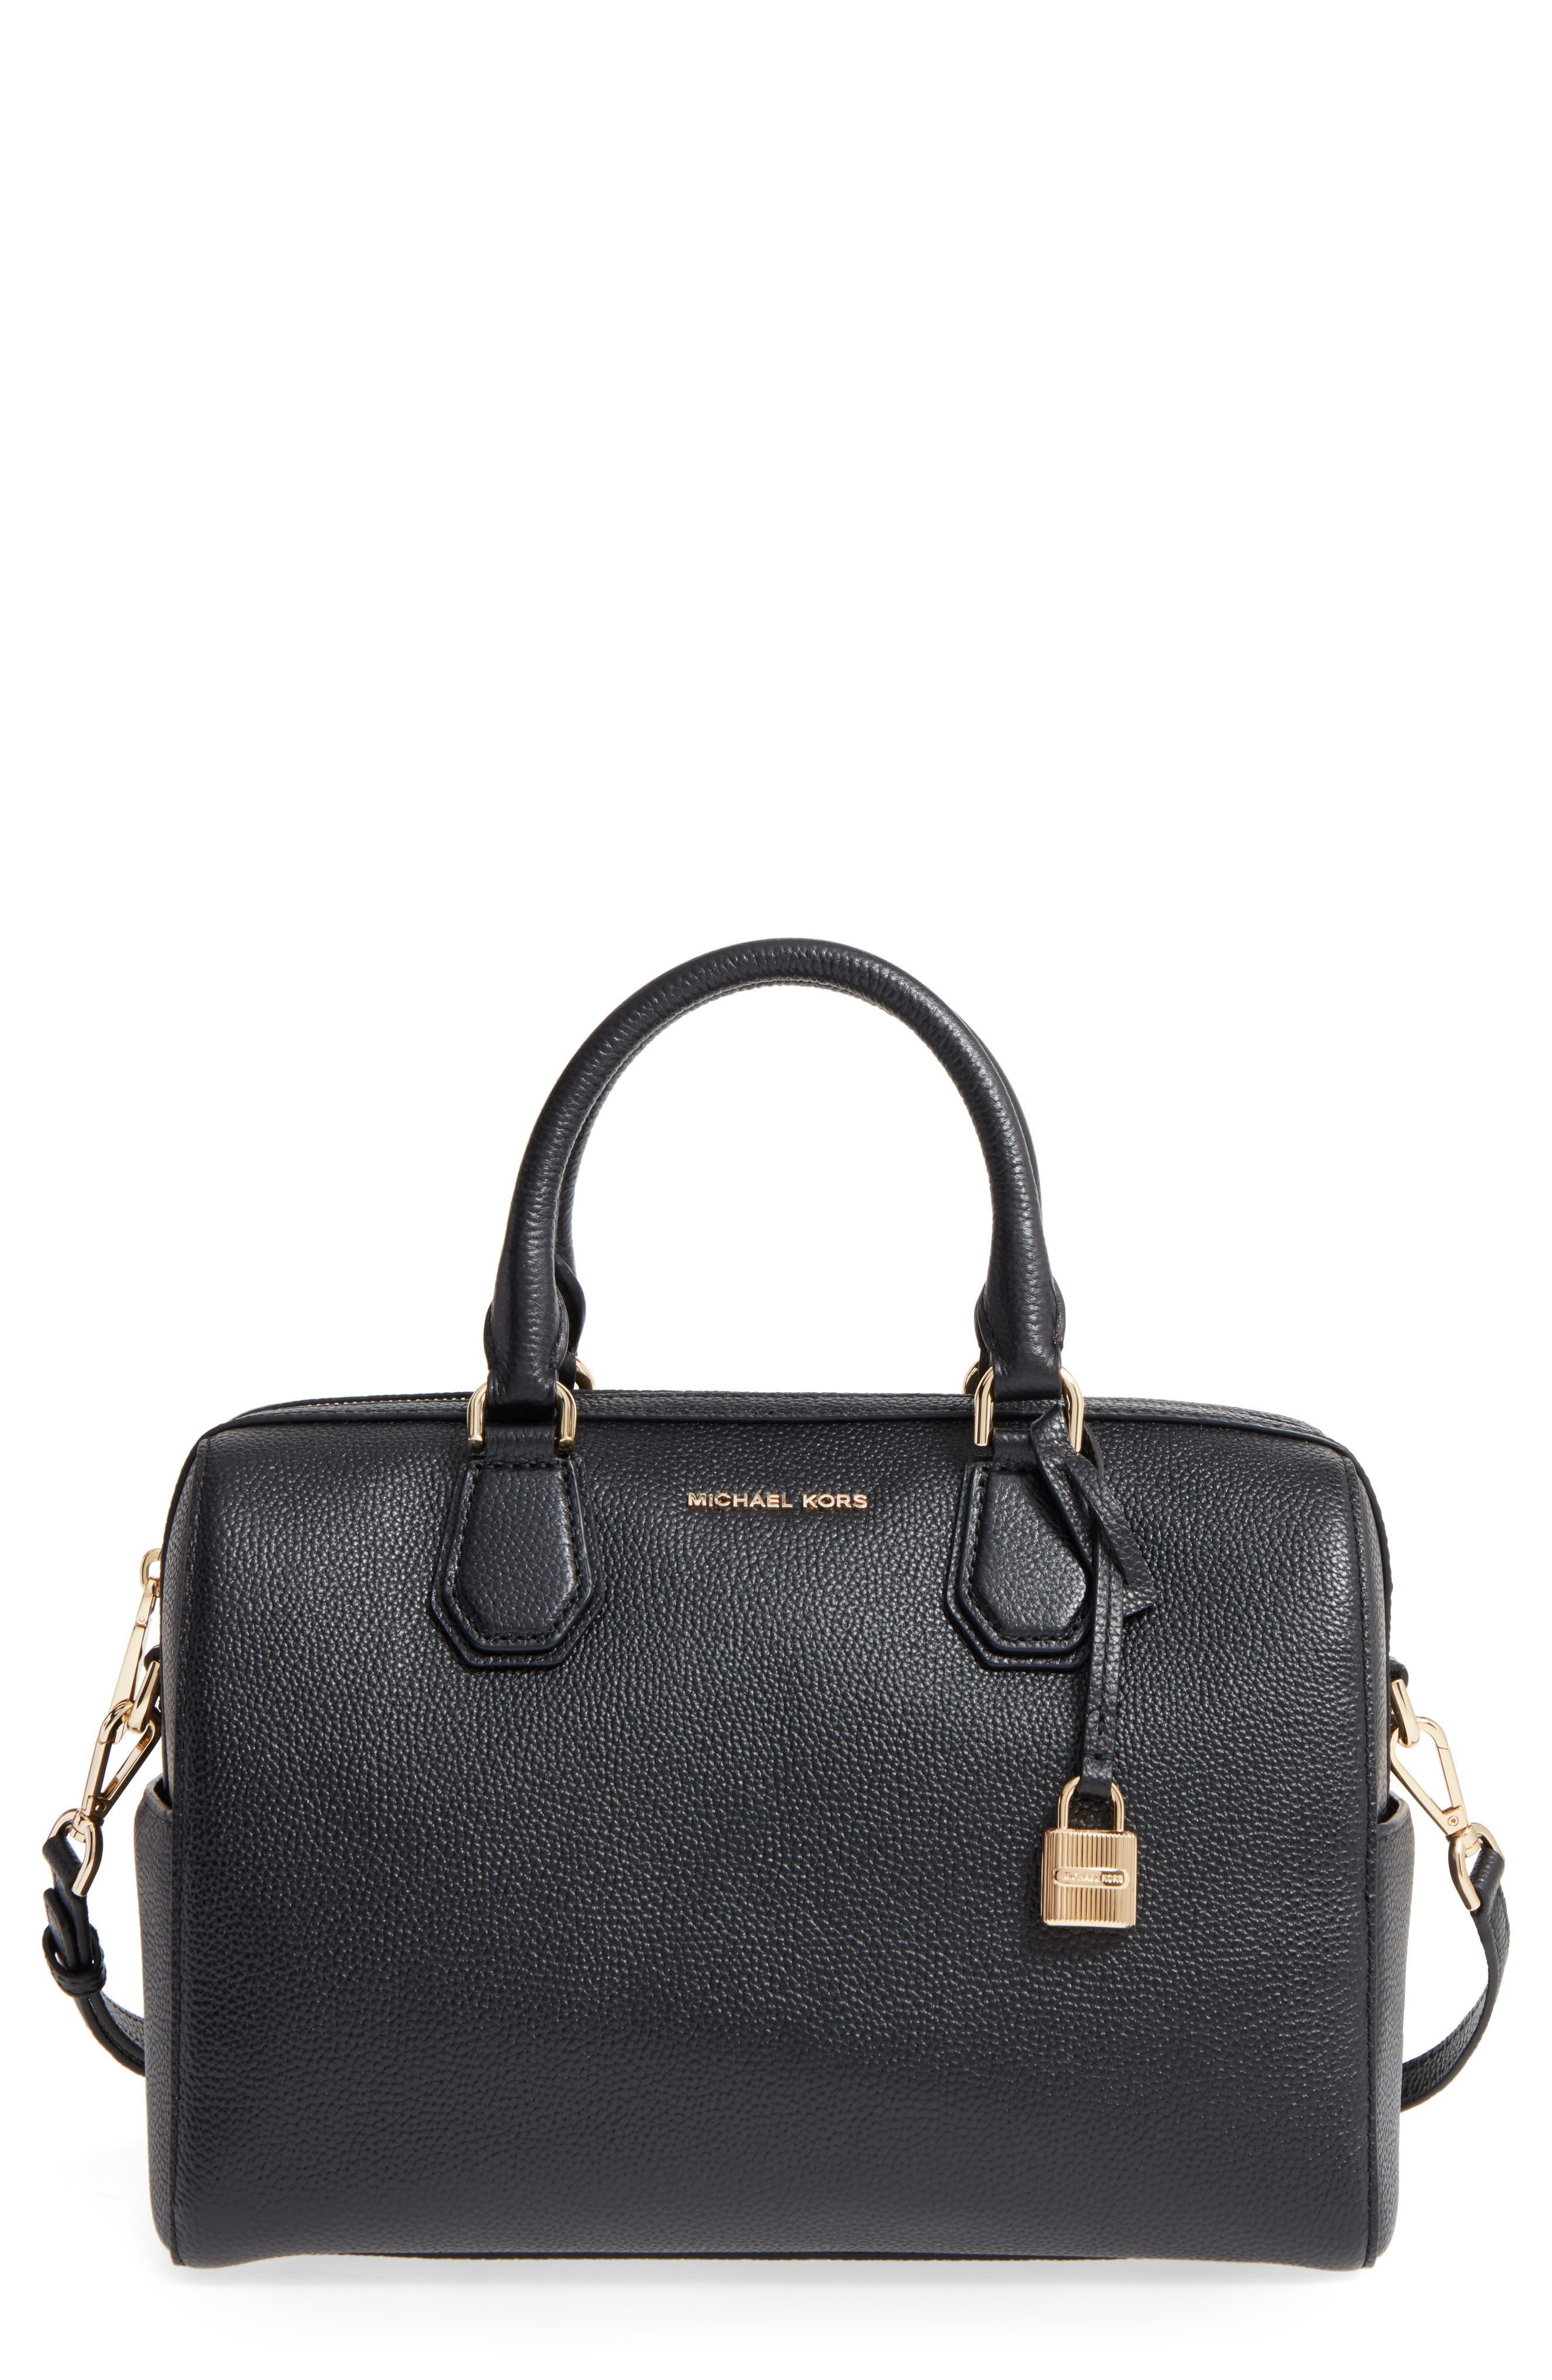 Medium Mercer Duffel Bag,                         Main,                         color, 001